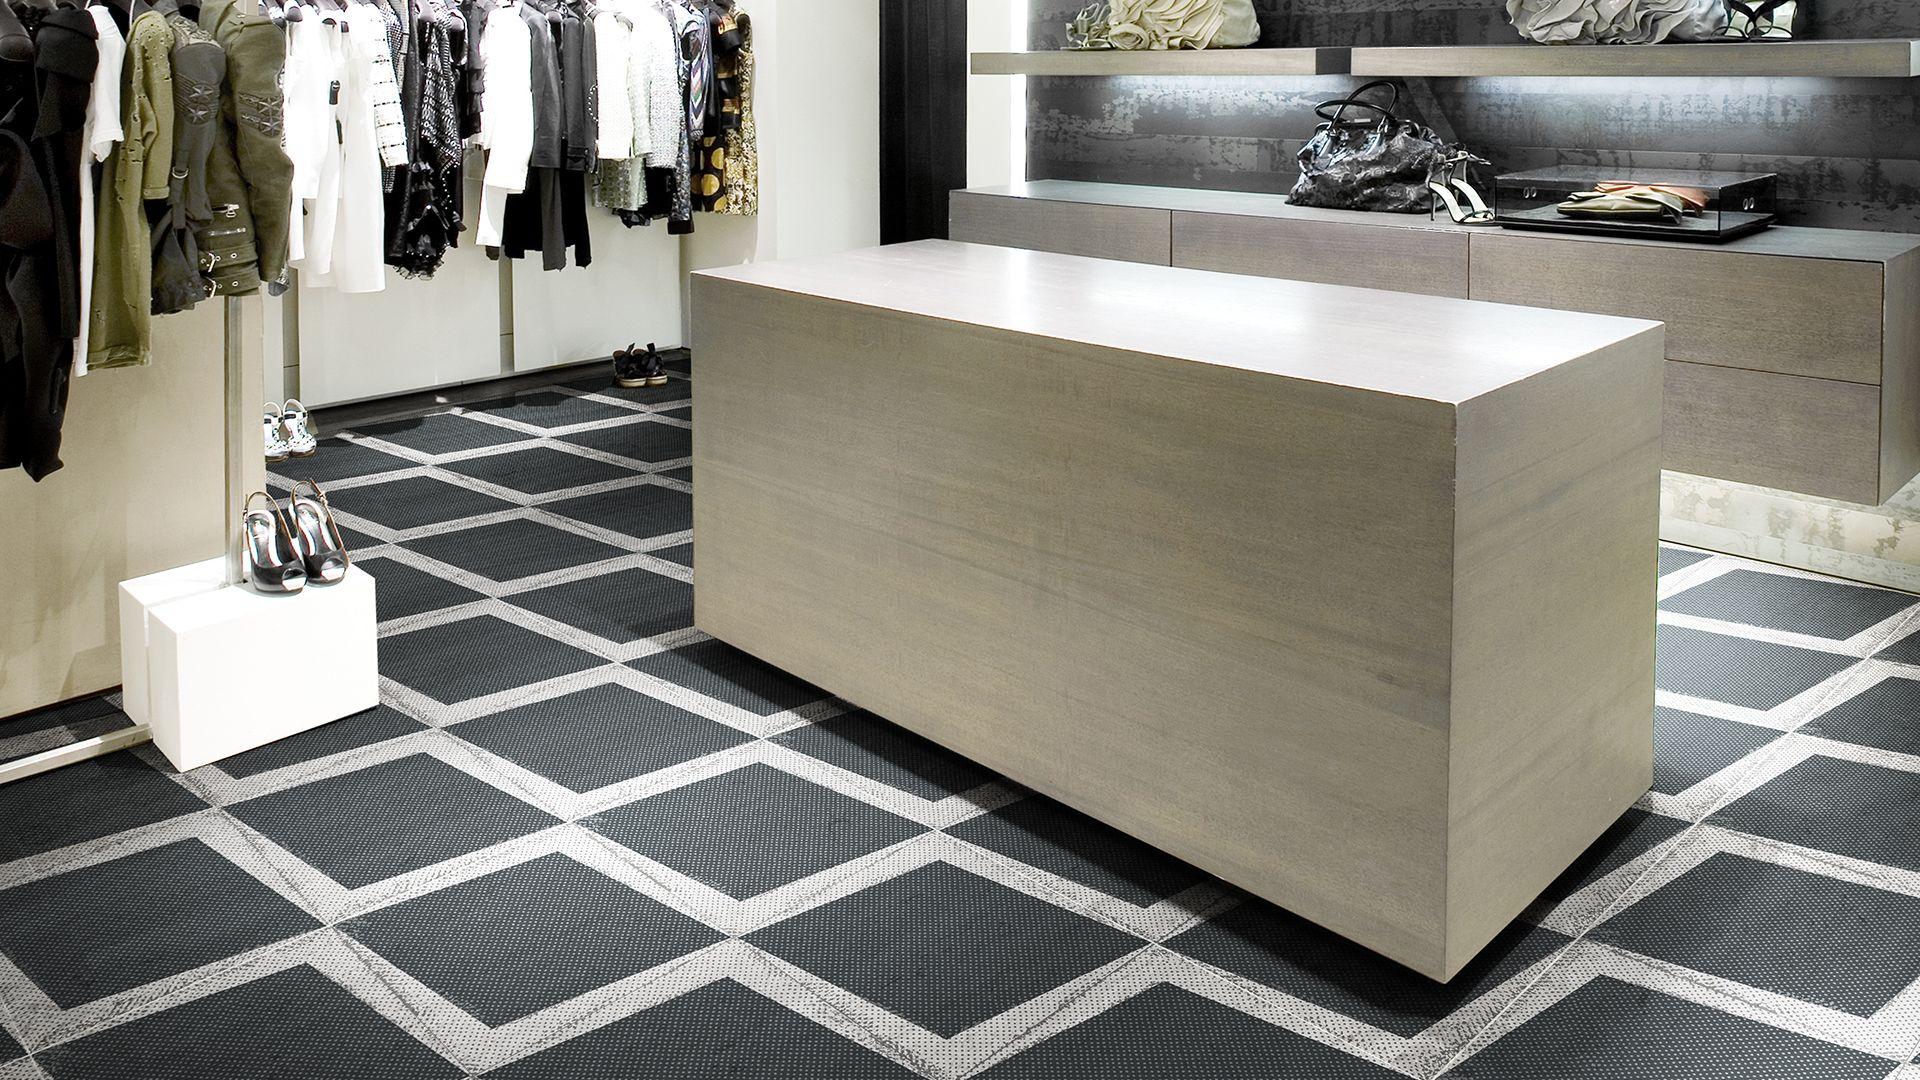 Vanite Salle De Bain Ciot ~ overlap collezioni unica ceramiche ceramic tiles pinterest